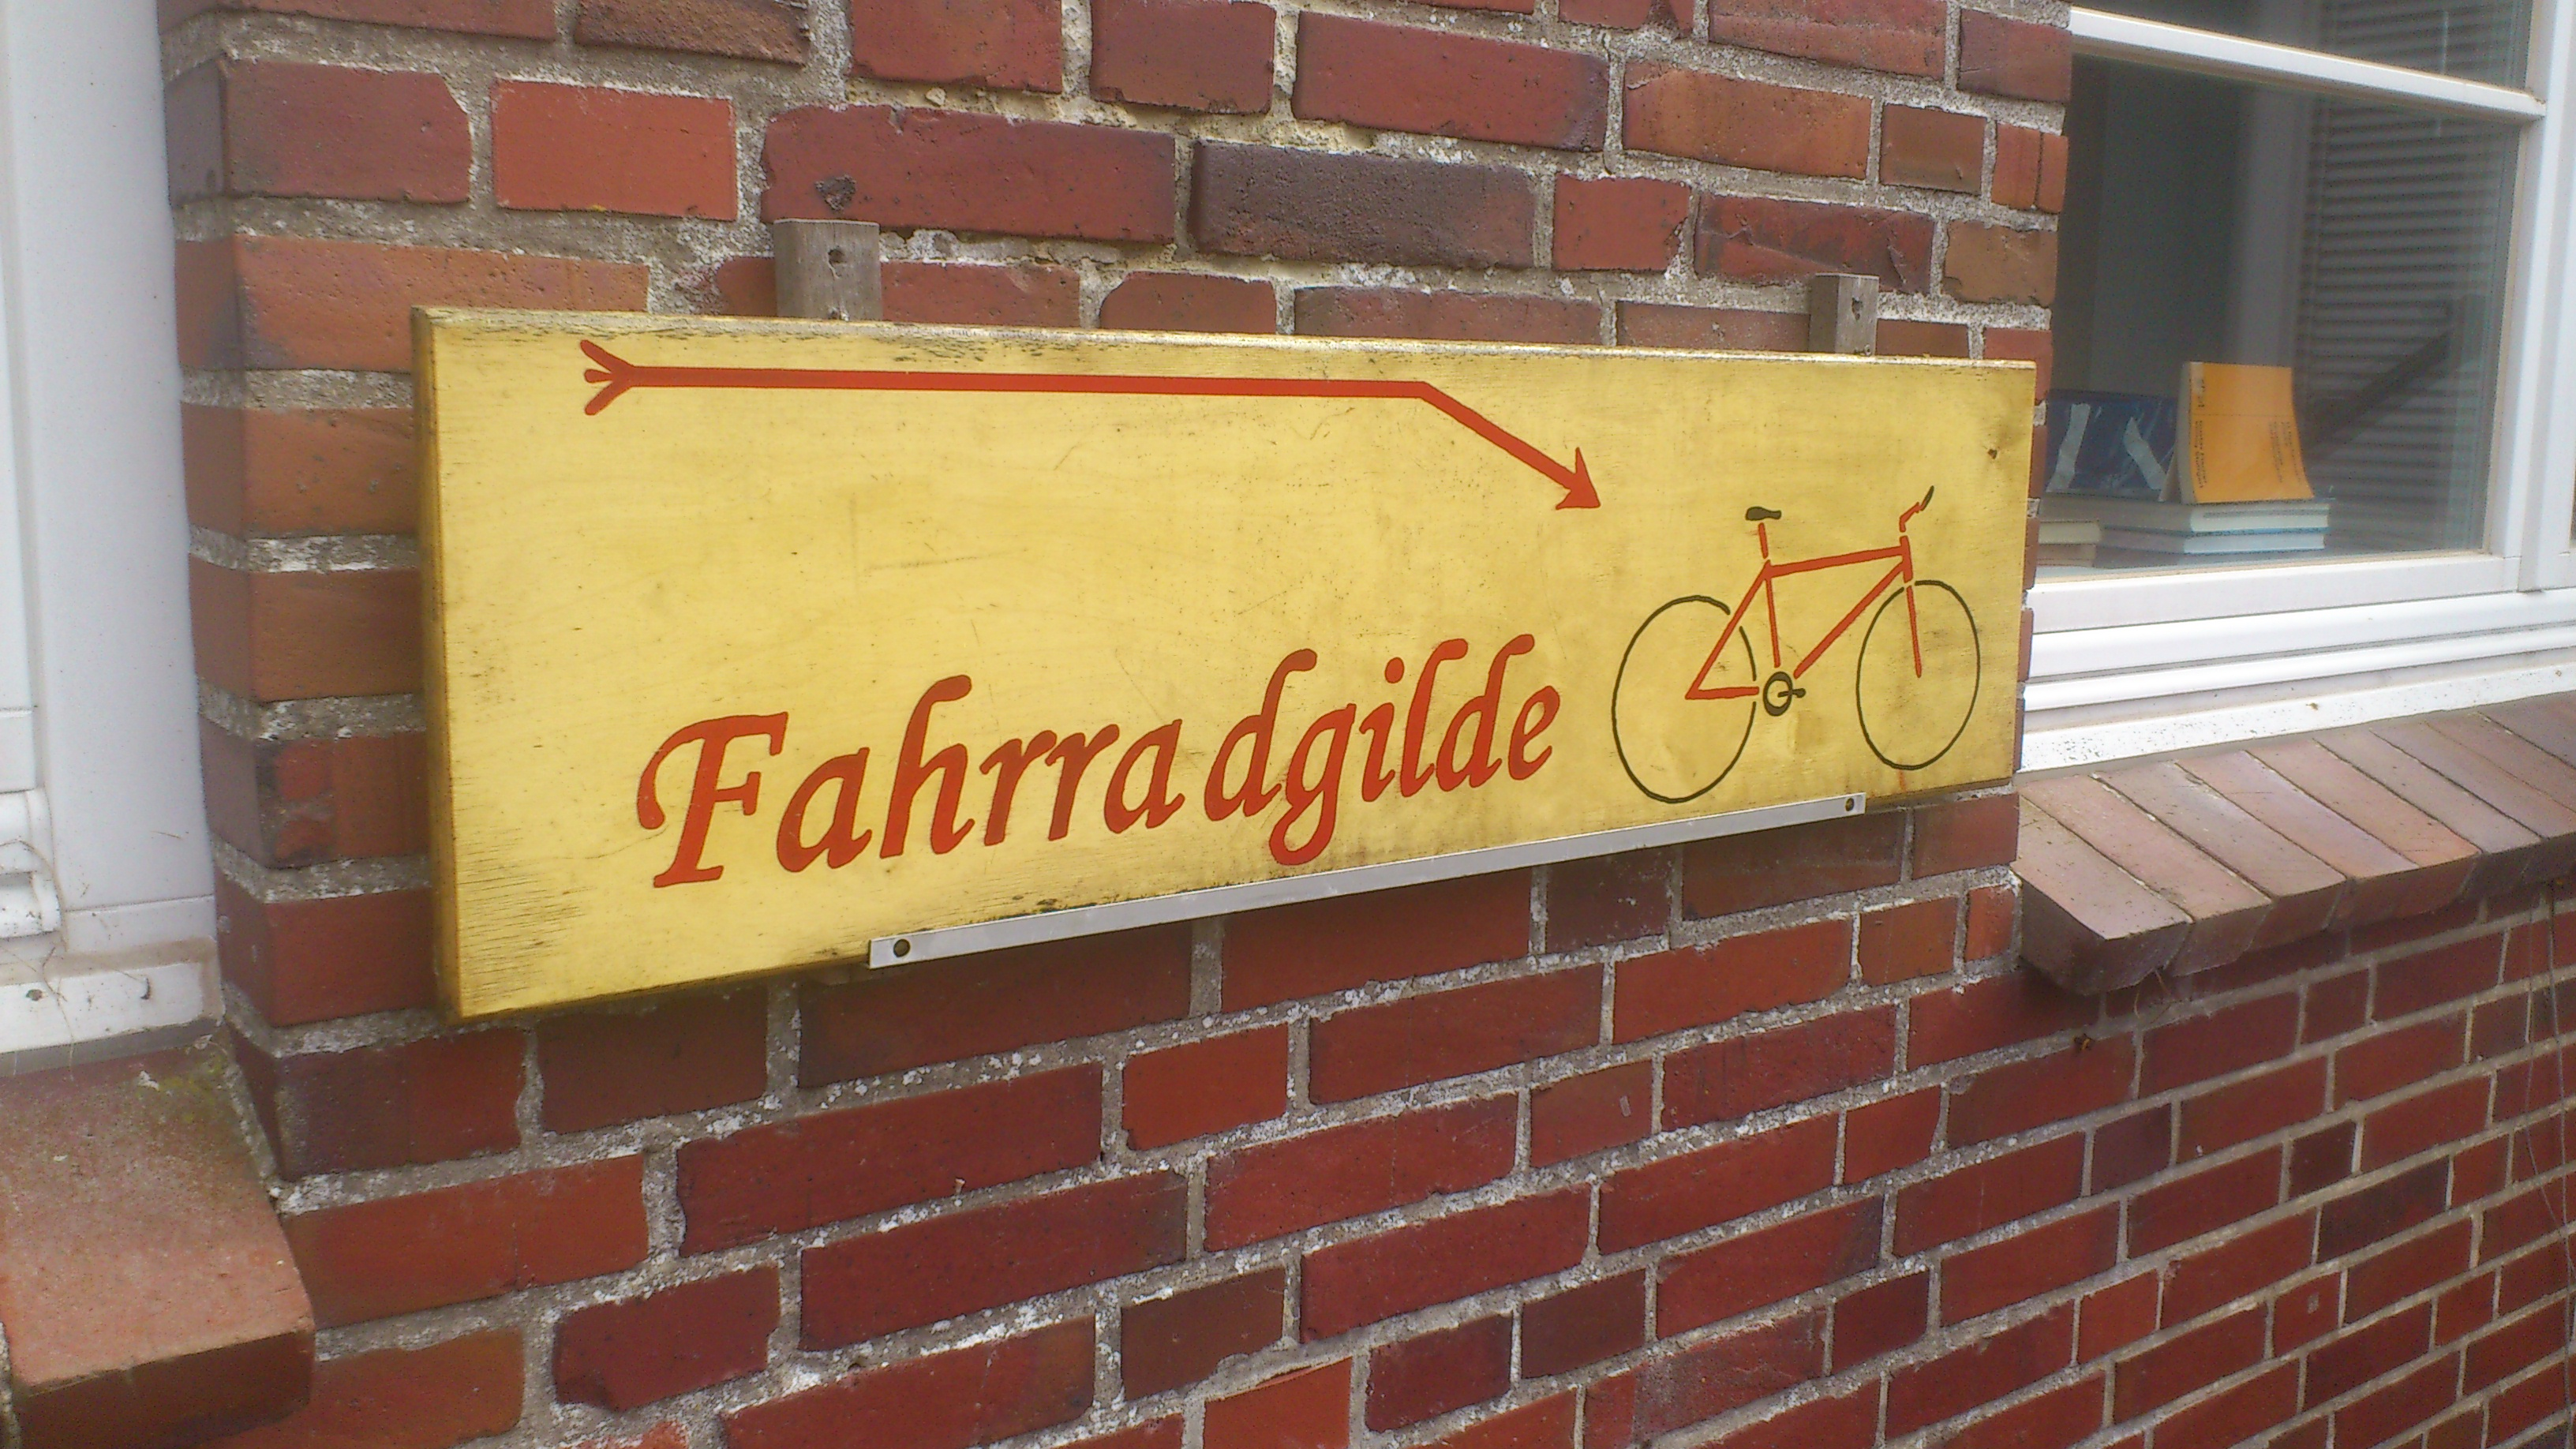 Fahrradgilde